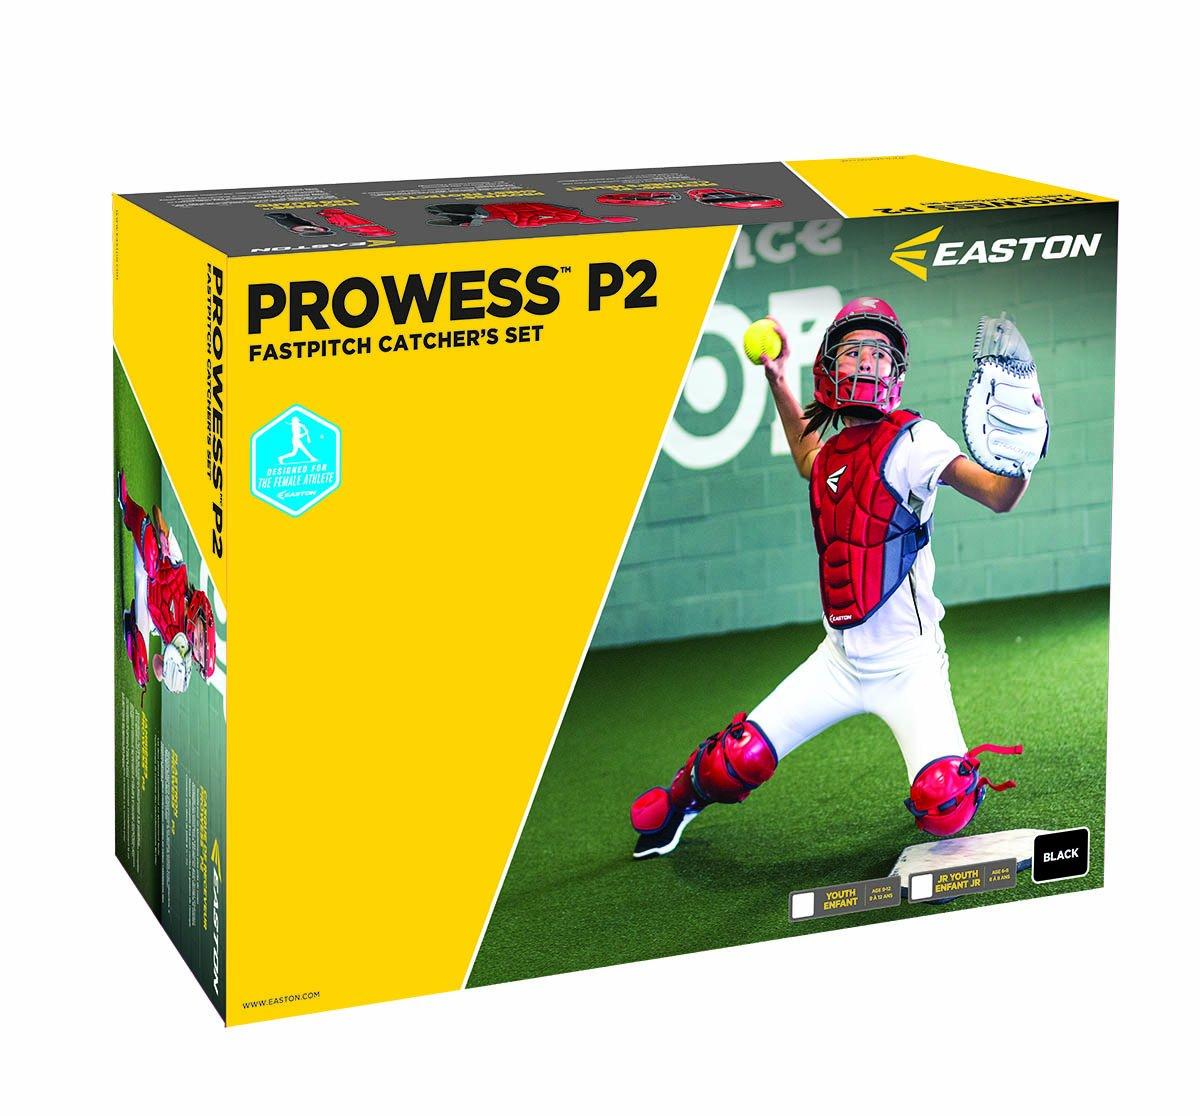 Easton Prowess P2 Fast Pitch Catchers Box Set